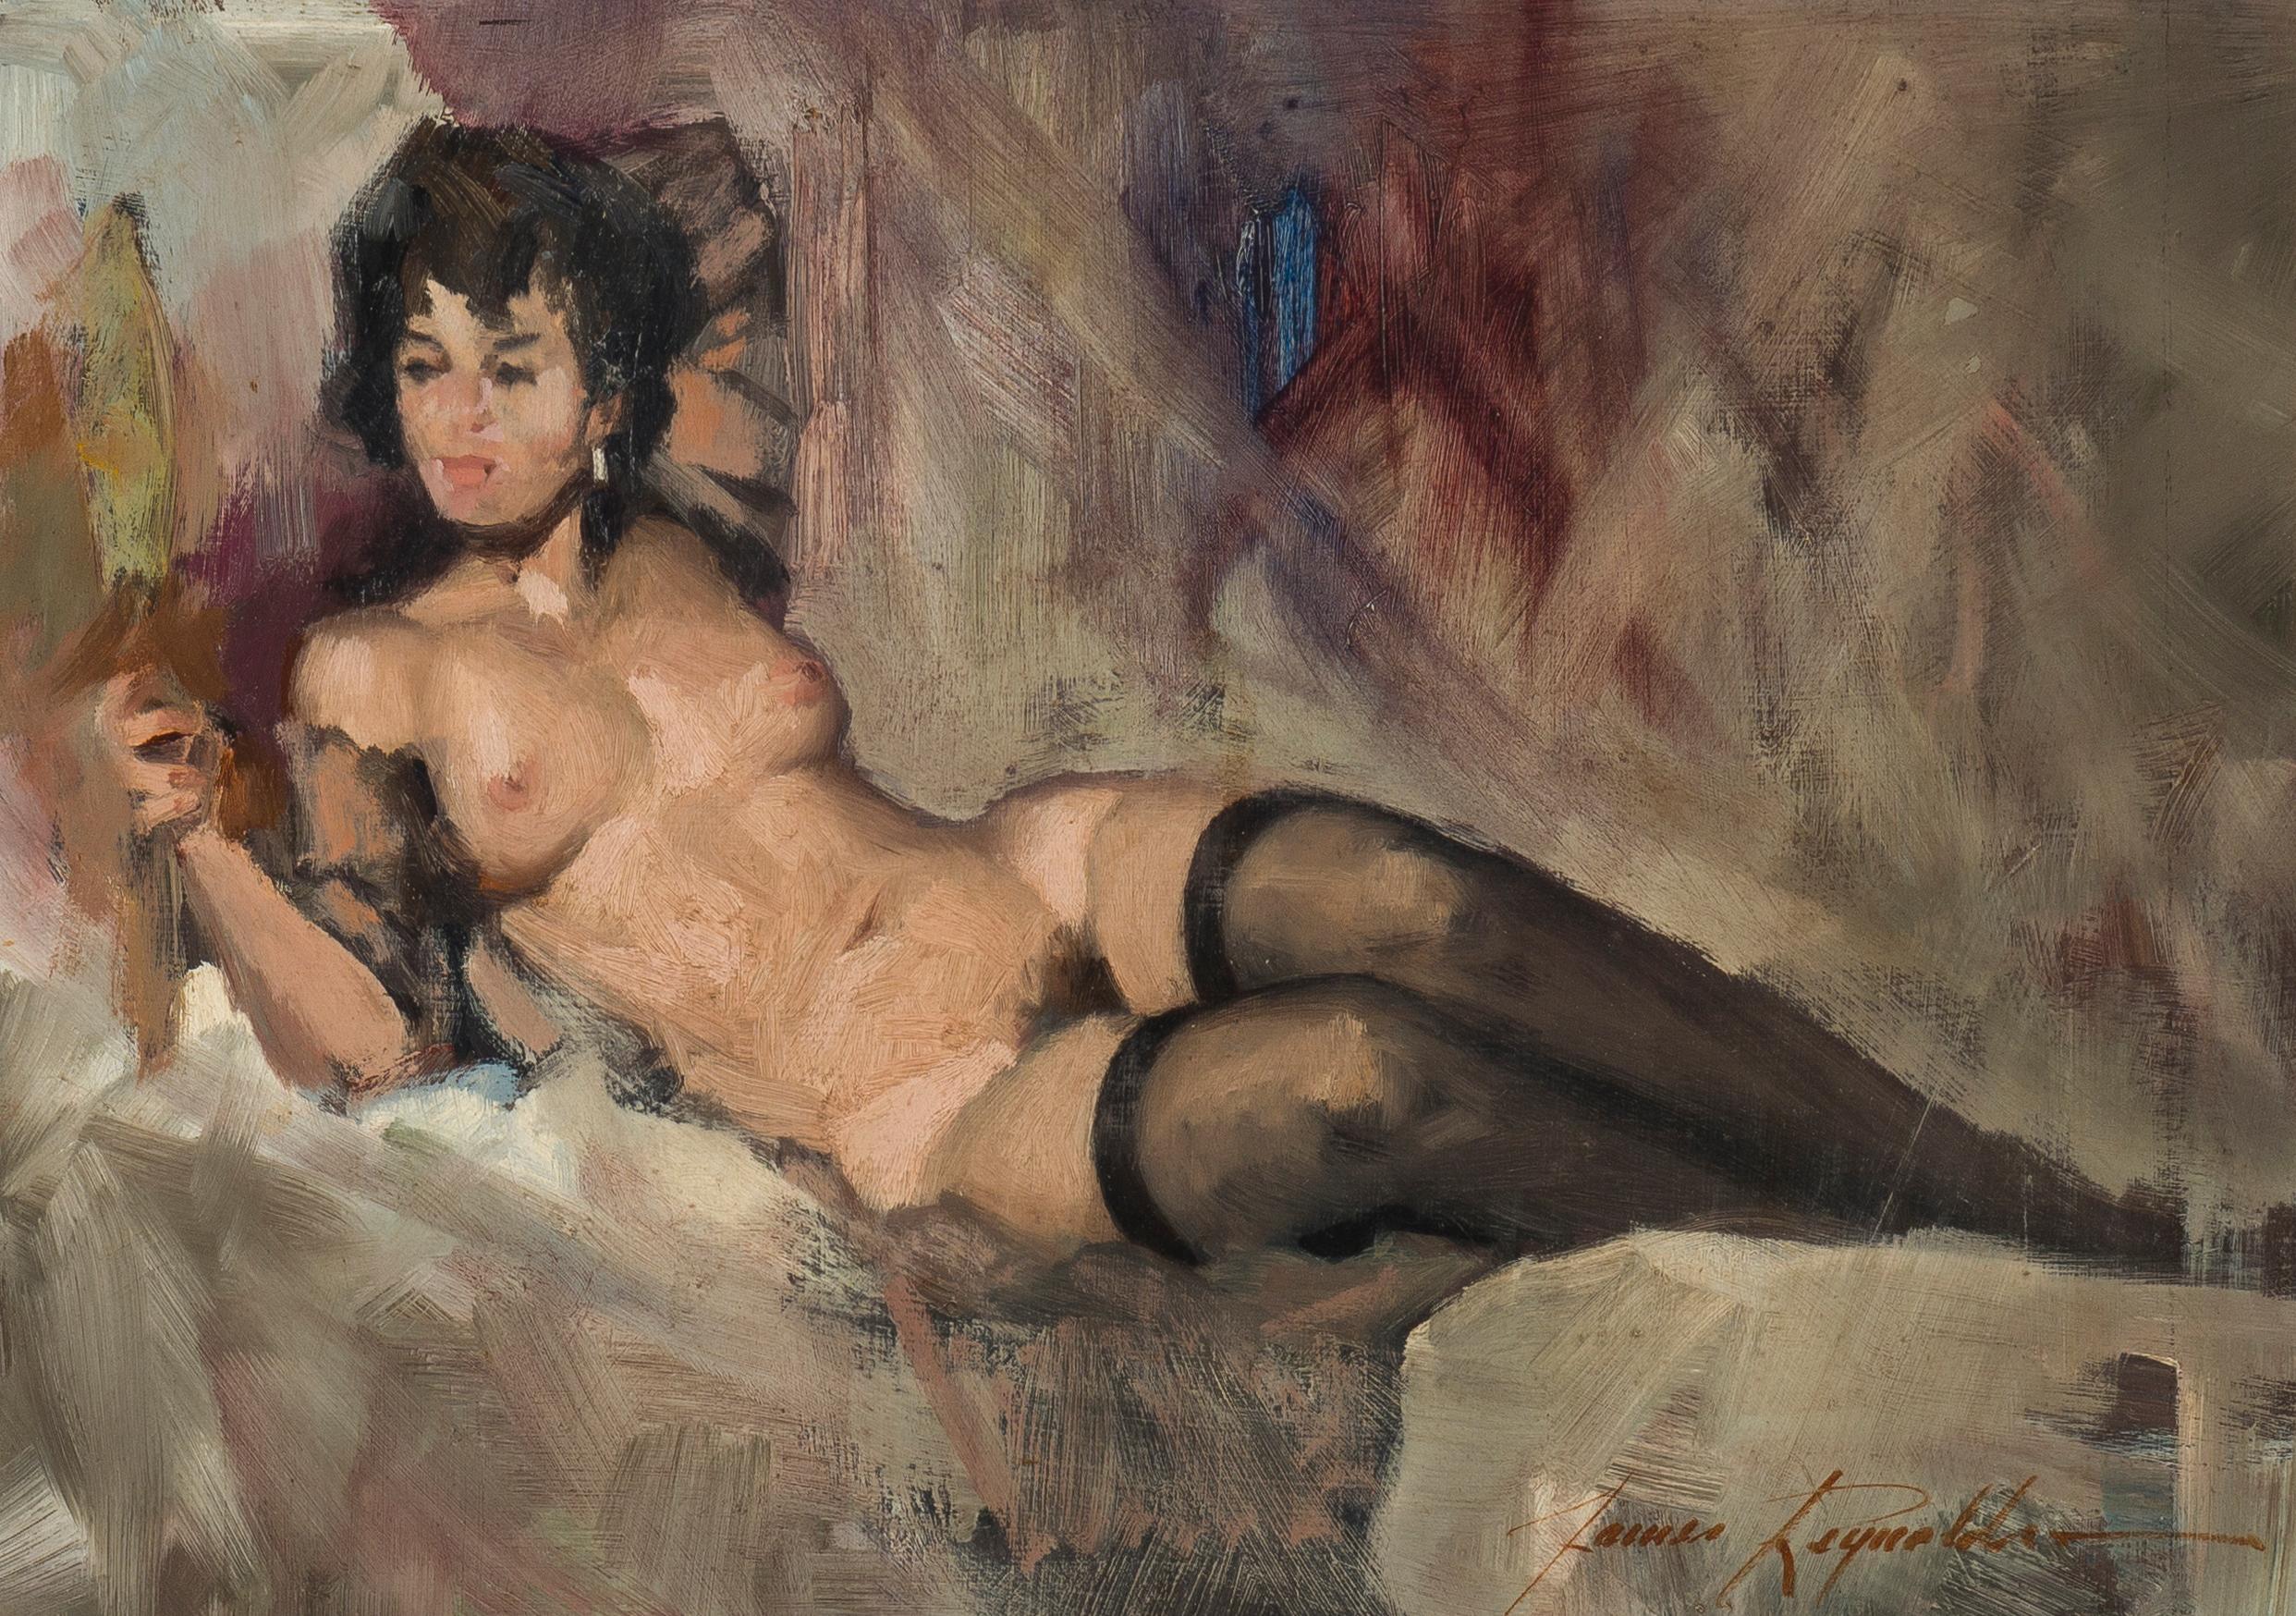 "James Elwood Reynolds, (1926-2010 Scottsdale, AZ), Reclining nude, Oil on masonite, 9.5"" H x 13"" W"